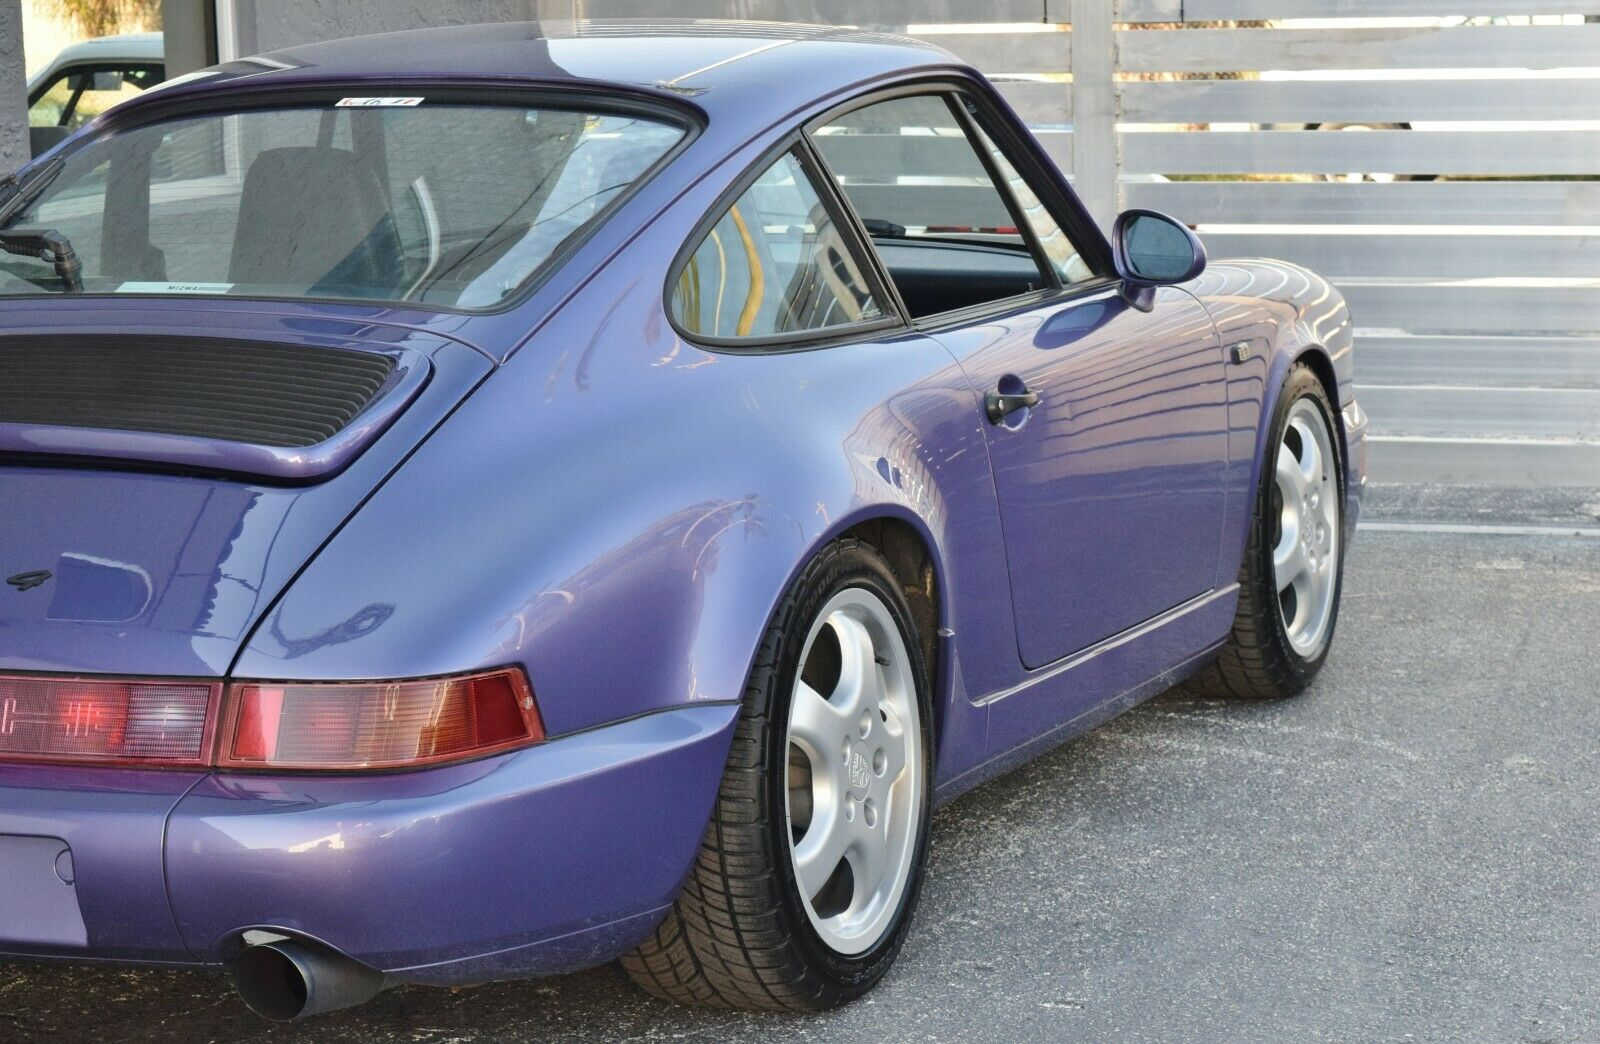 1991 Porsche 911 Carrera 4 964 Coupe Viola Blue Metallic-Euro-SUNROOF DELETE-ONLY 33K MILES-Certificate of authenticity